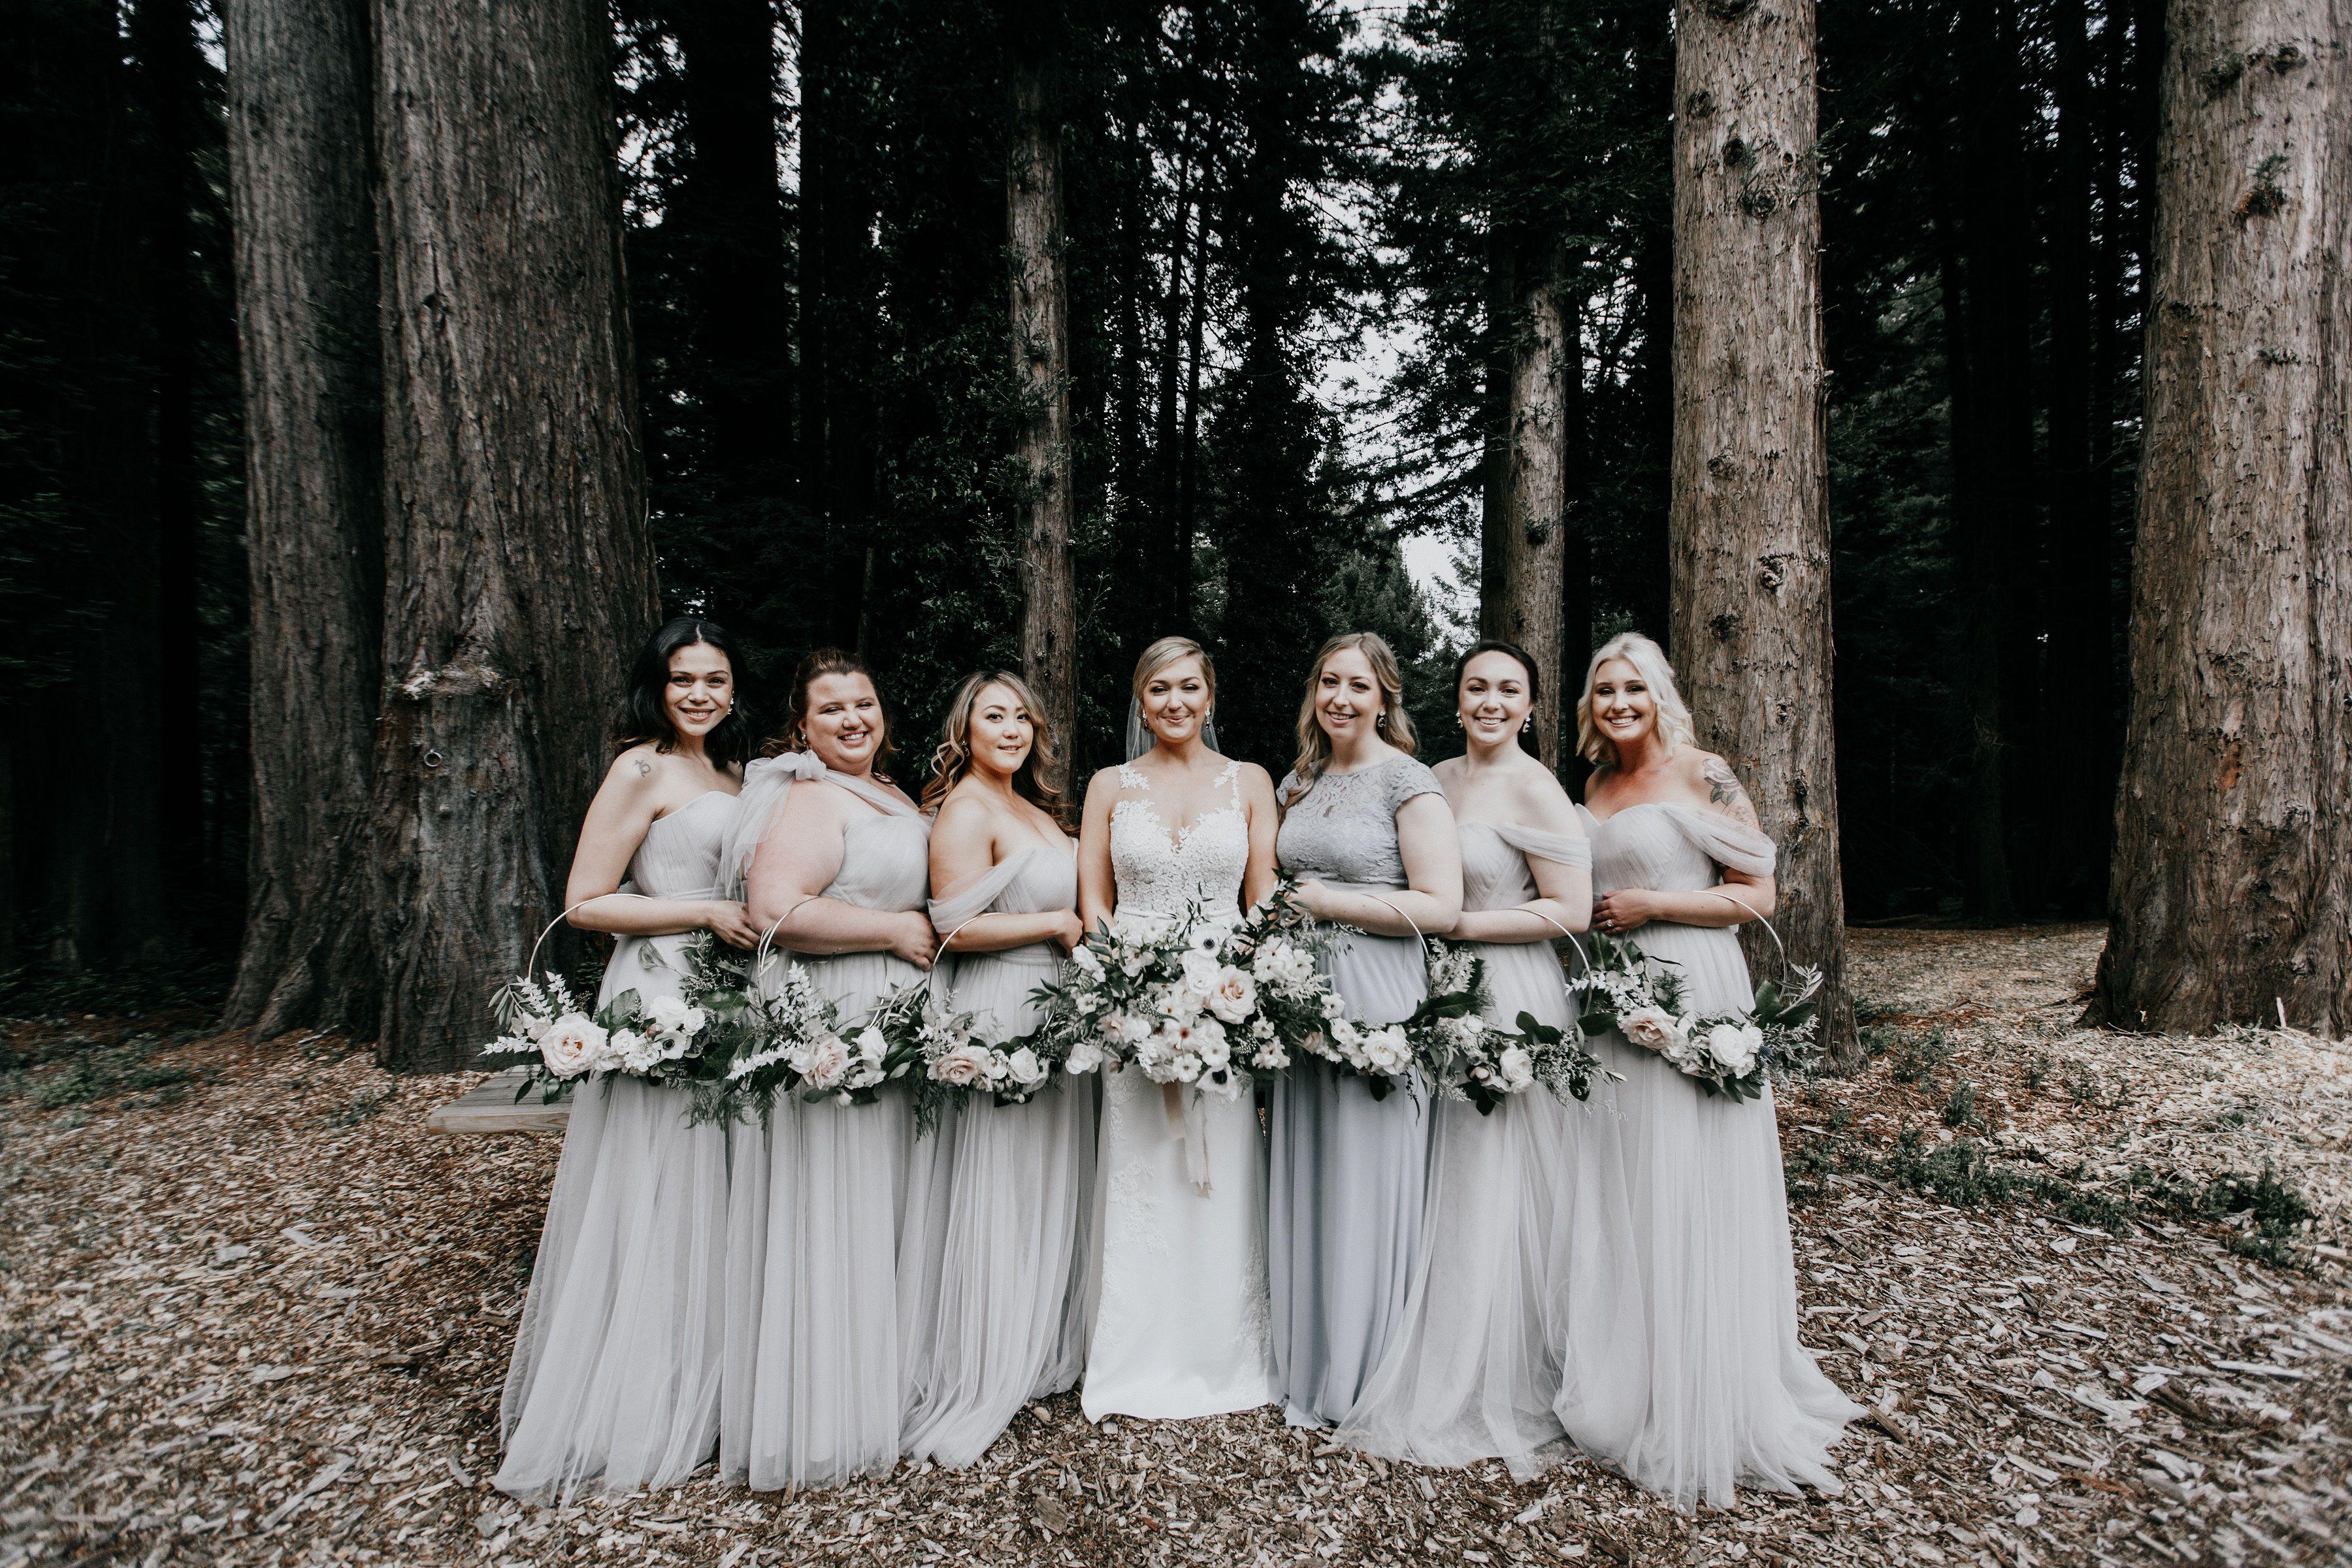 Moody Garden Style Wedding at The Mountain Terrace